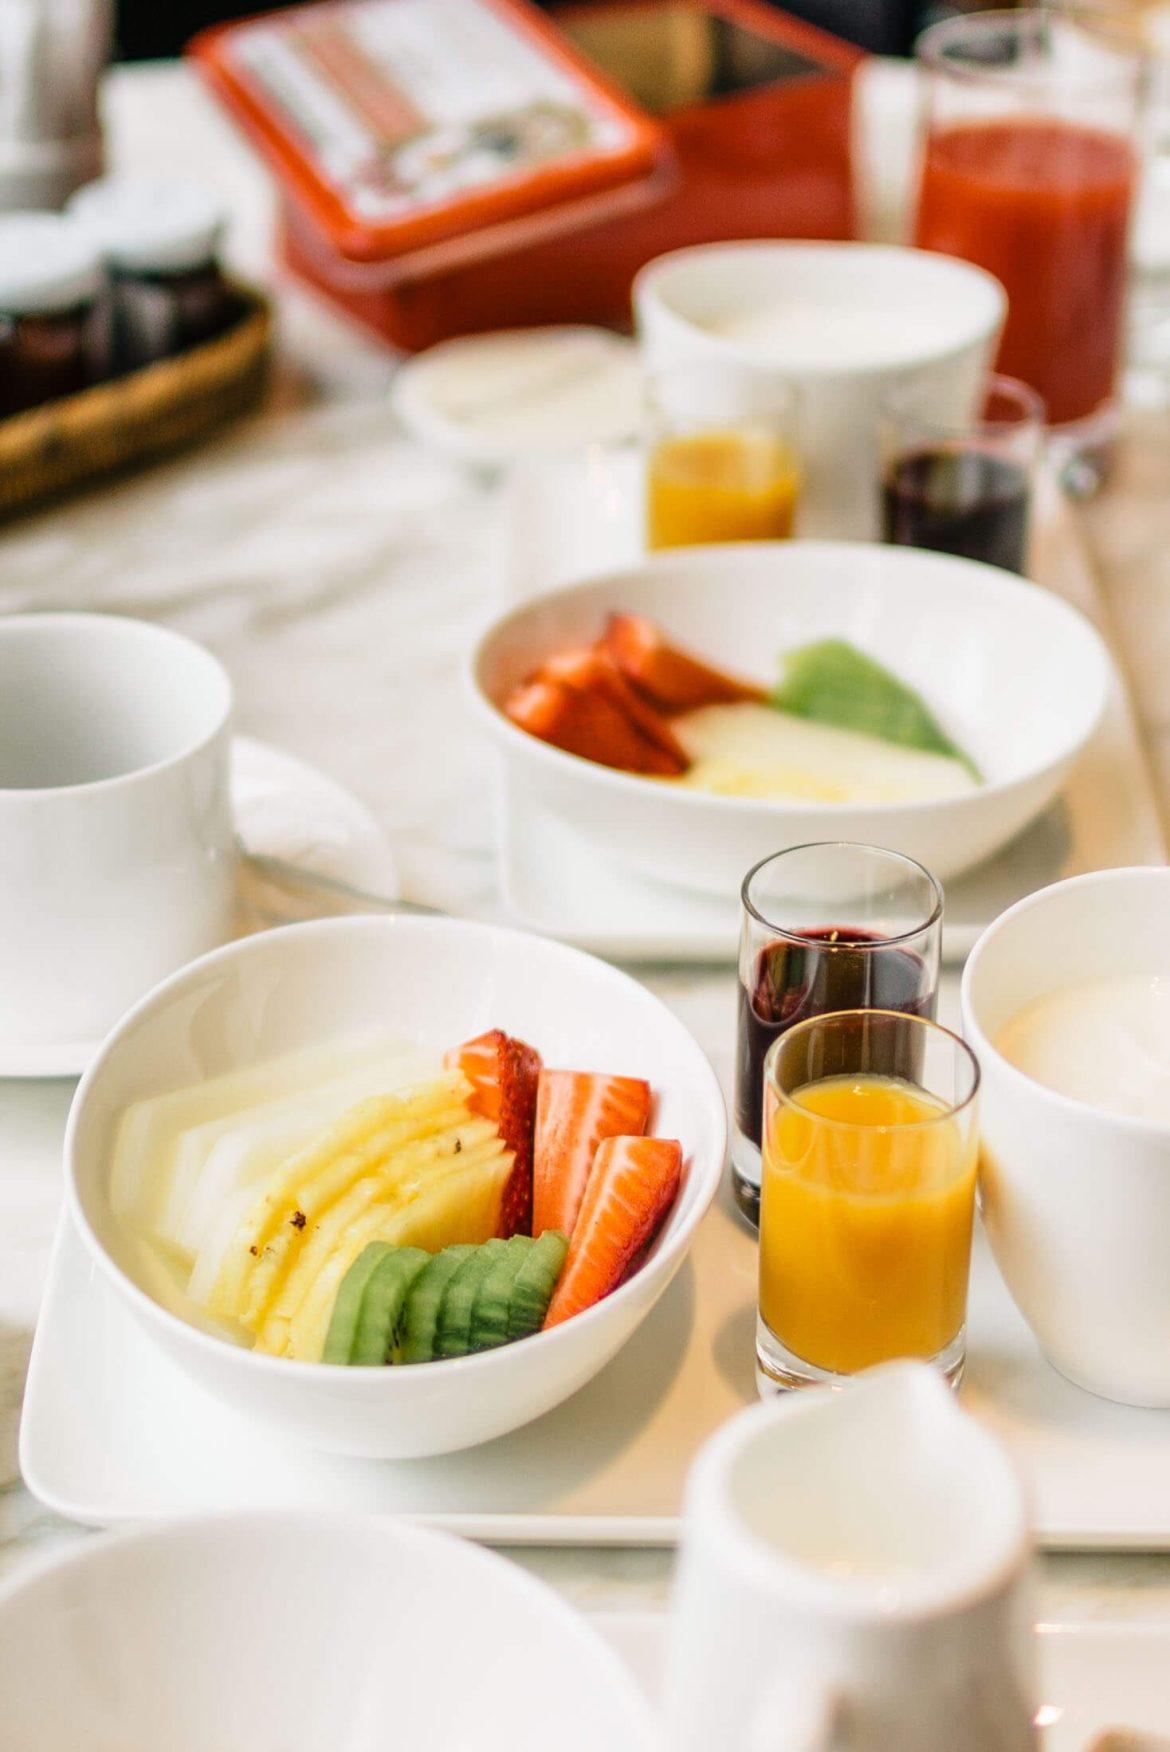 Yogurt and fruit for breakfast at Hotel Bulgari Milano, The Taste Edit